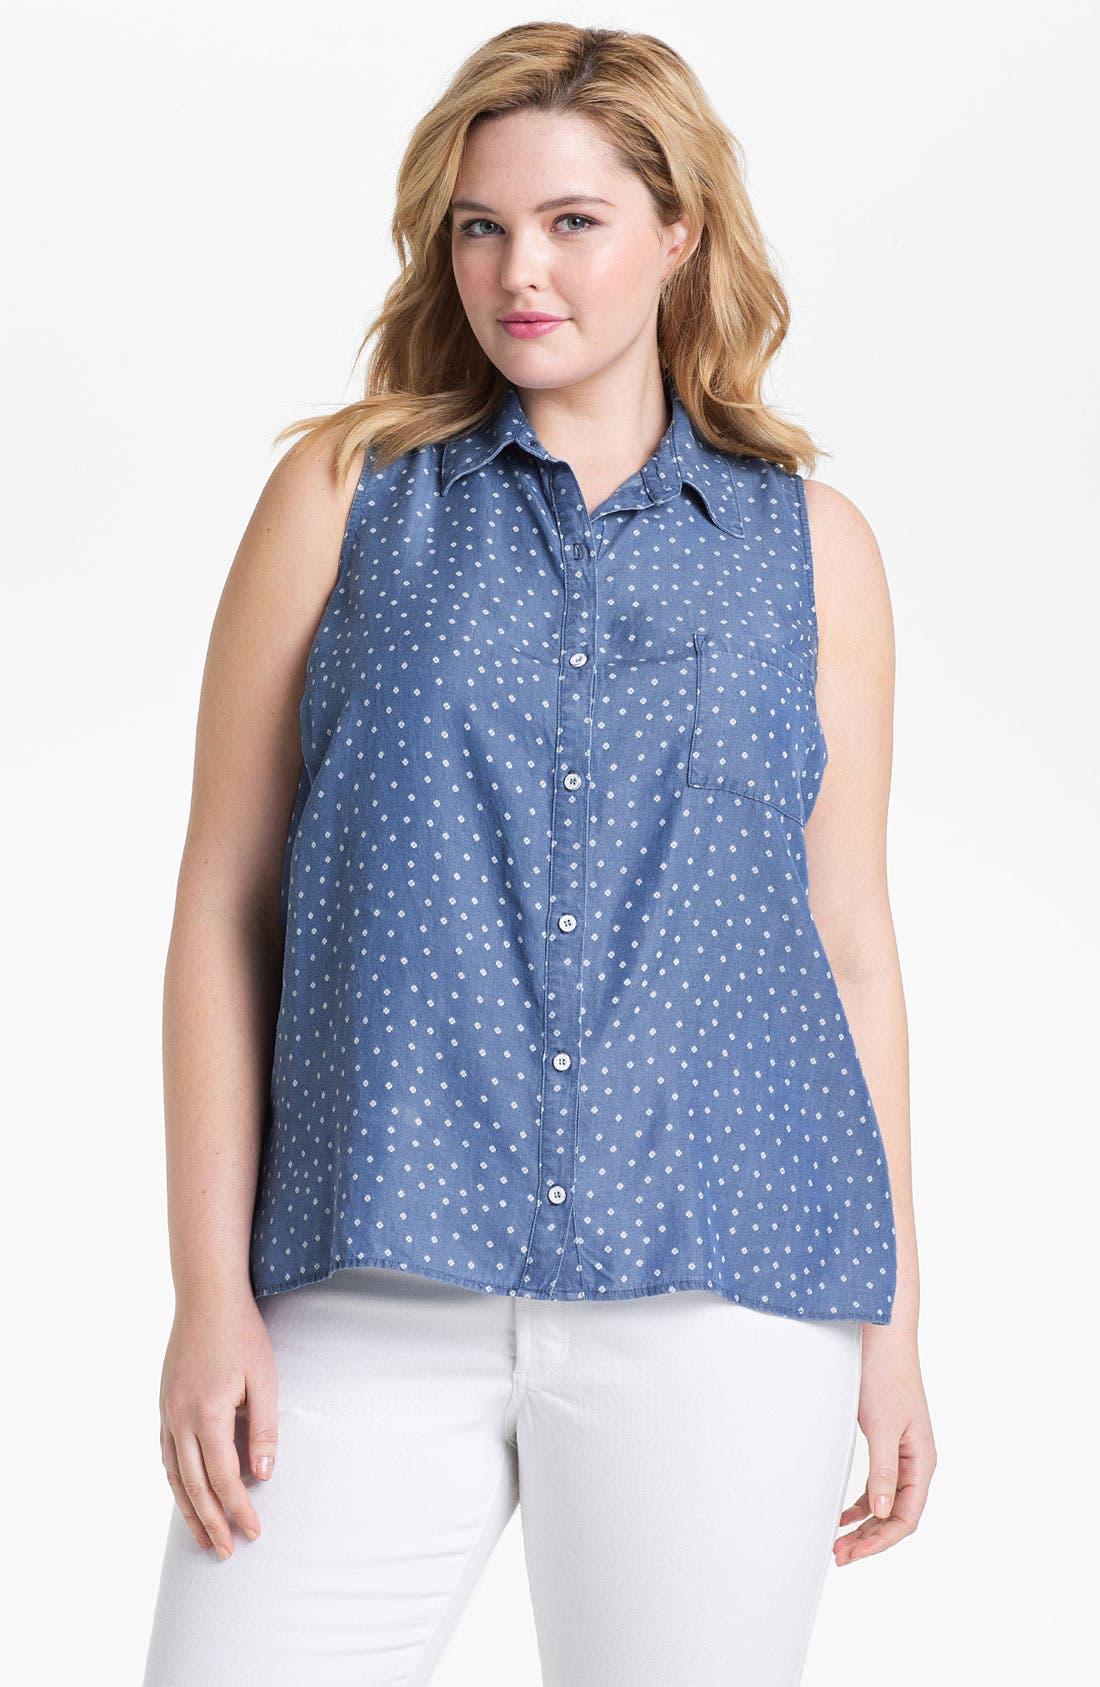 Alternate Image 1 Selected - Splendid 'Ditzy' Polka Dot Chambray Shirt (Plus)